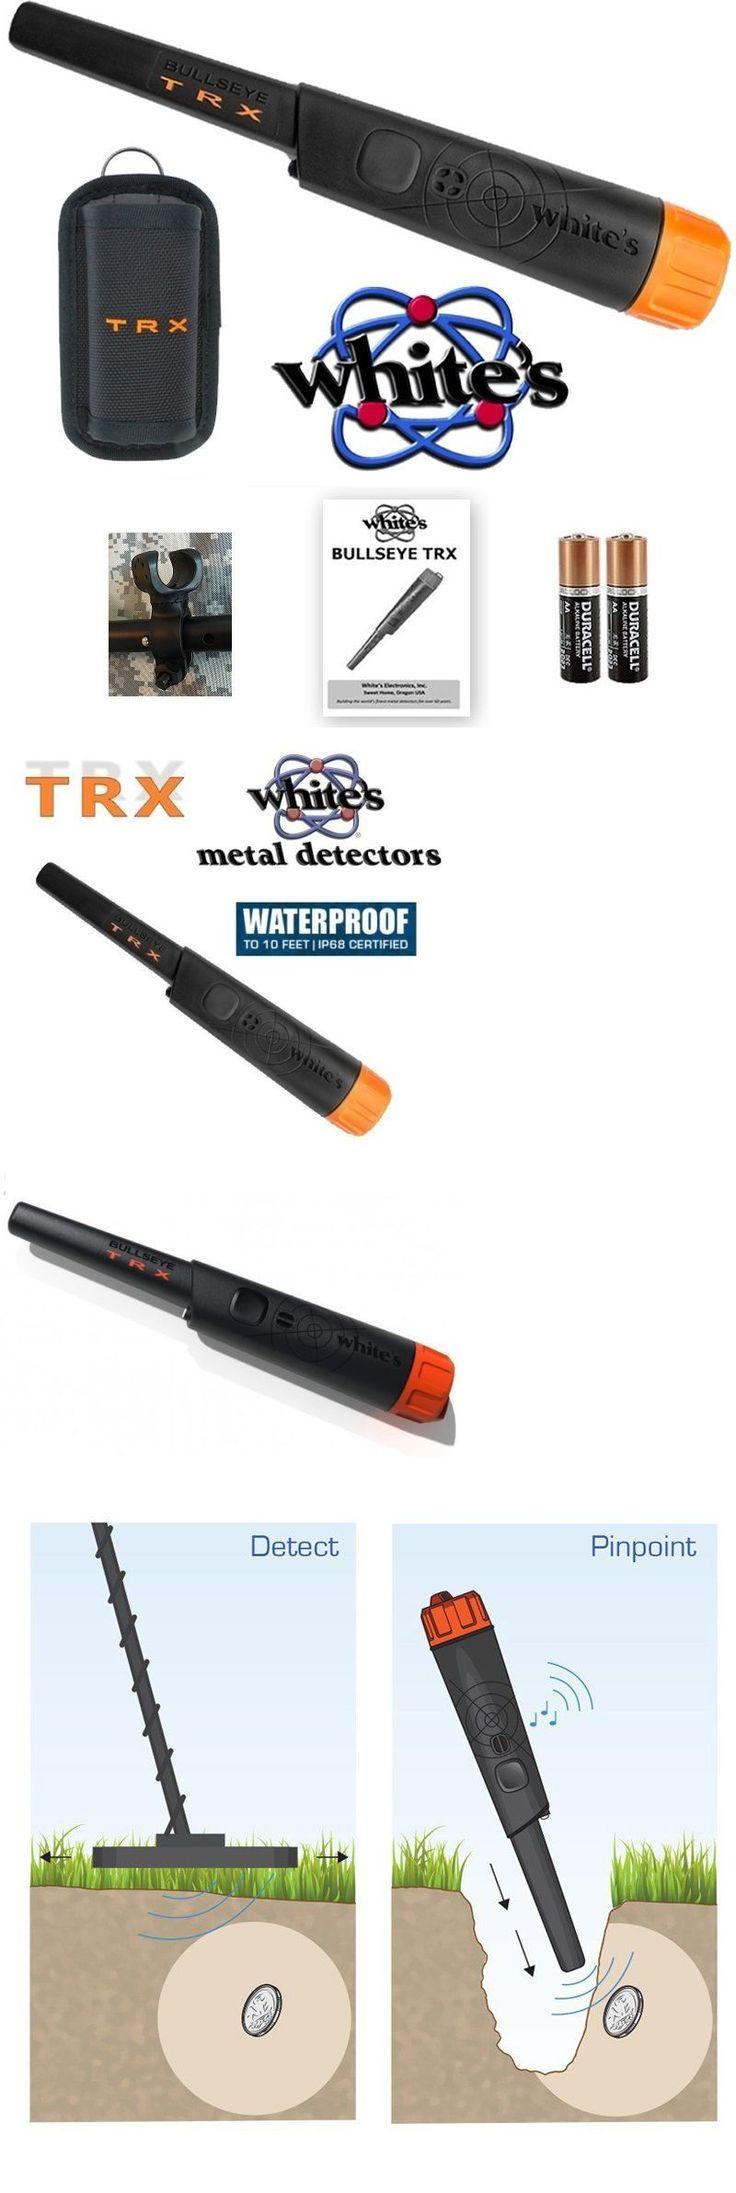 Metal Detectors: Whites Bullseye Trx Pinpointer Metal Detector Pro Pin Pointer + Holster And Holder BUY IT NOW ONLY: $149.95